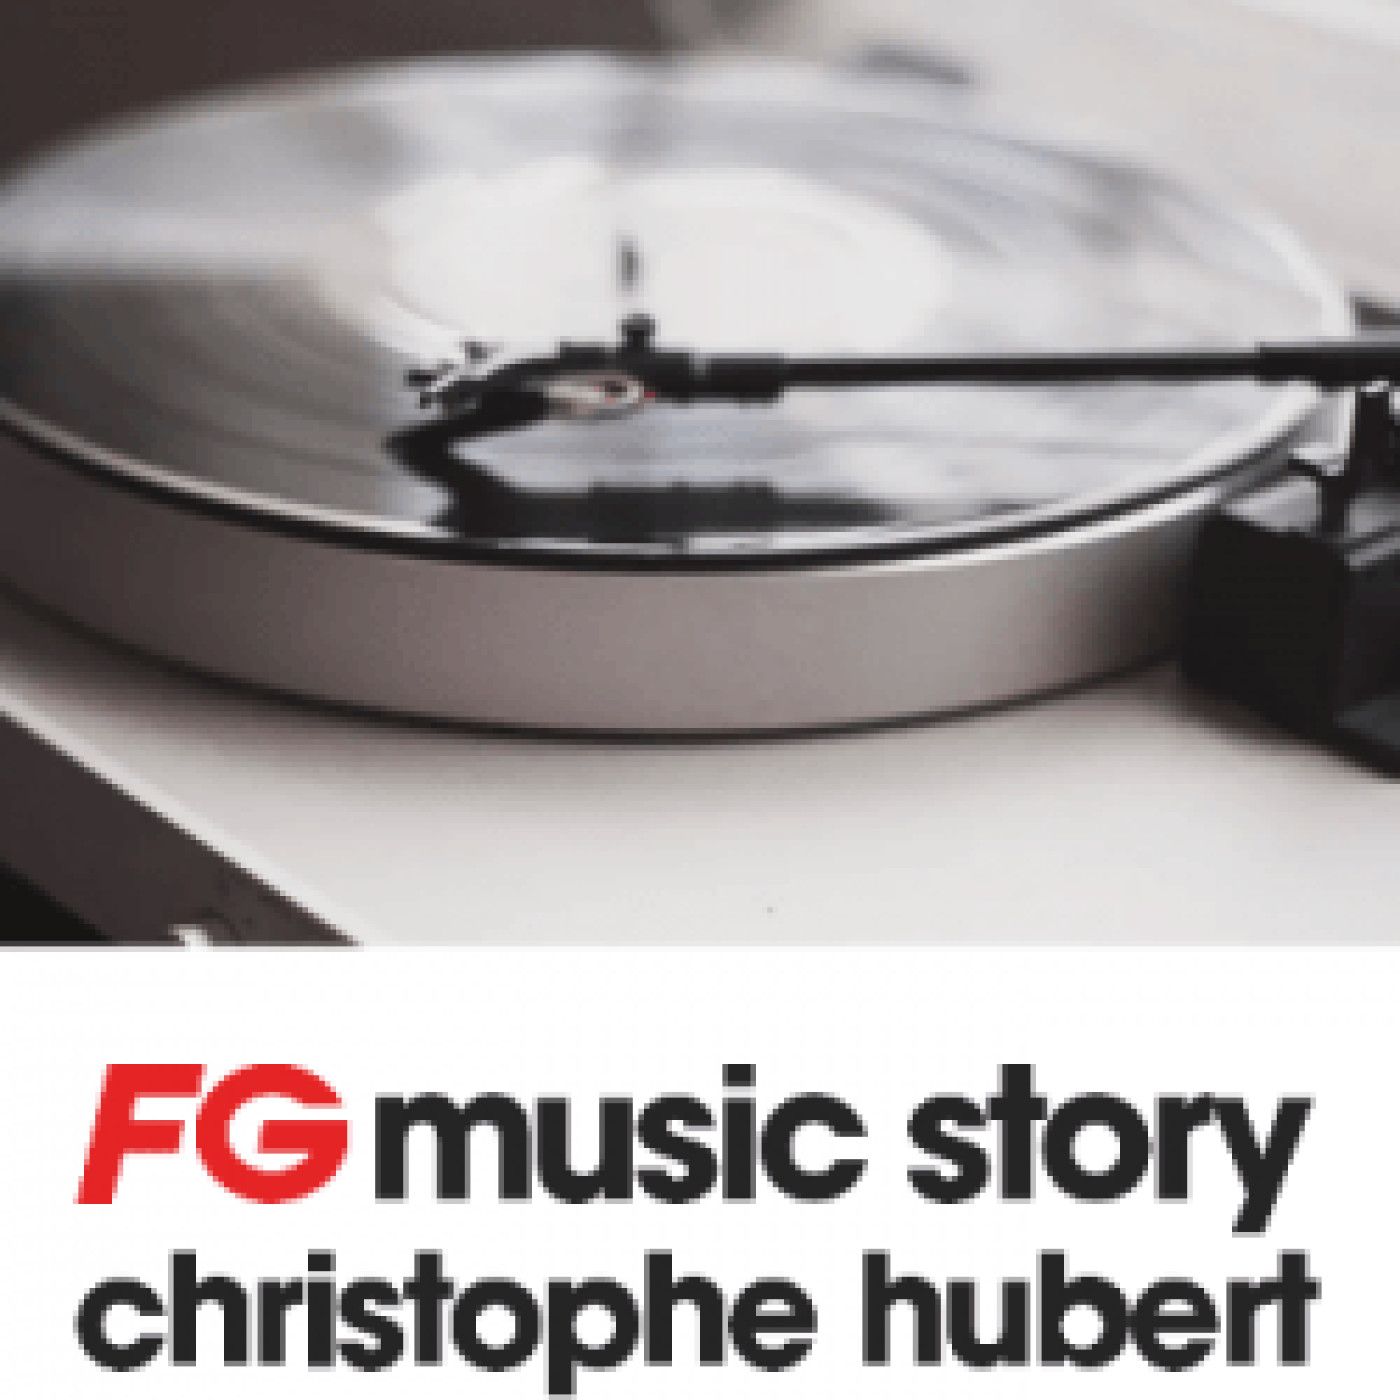 FG MUSIC STORY : MOME